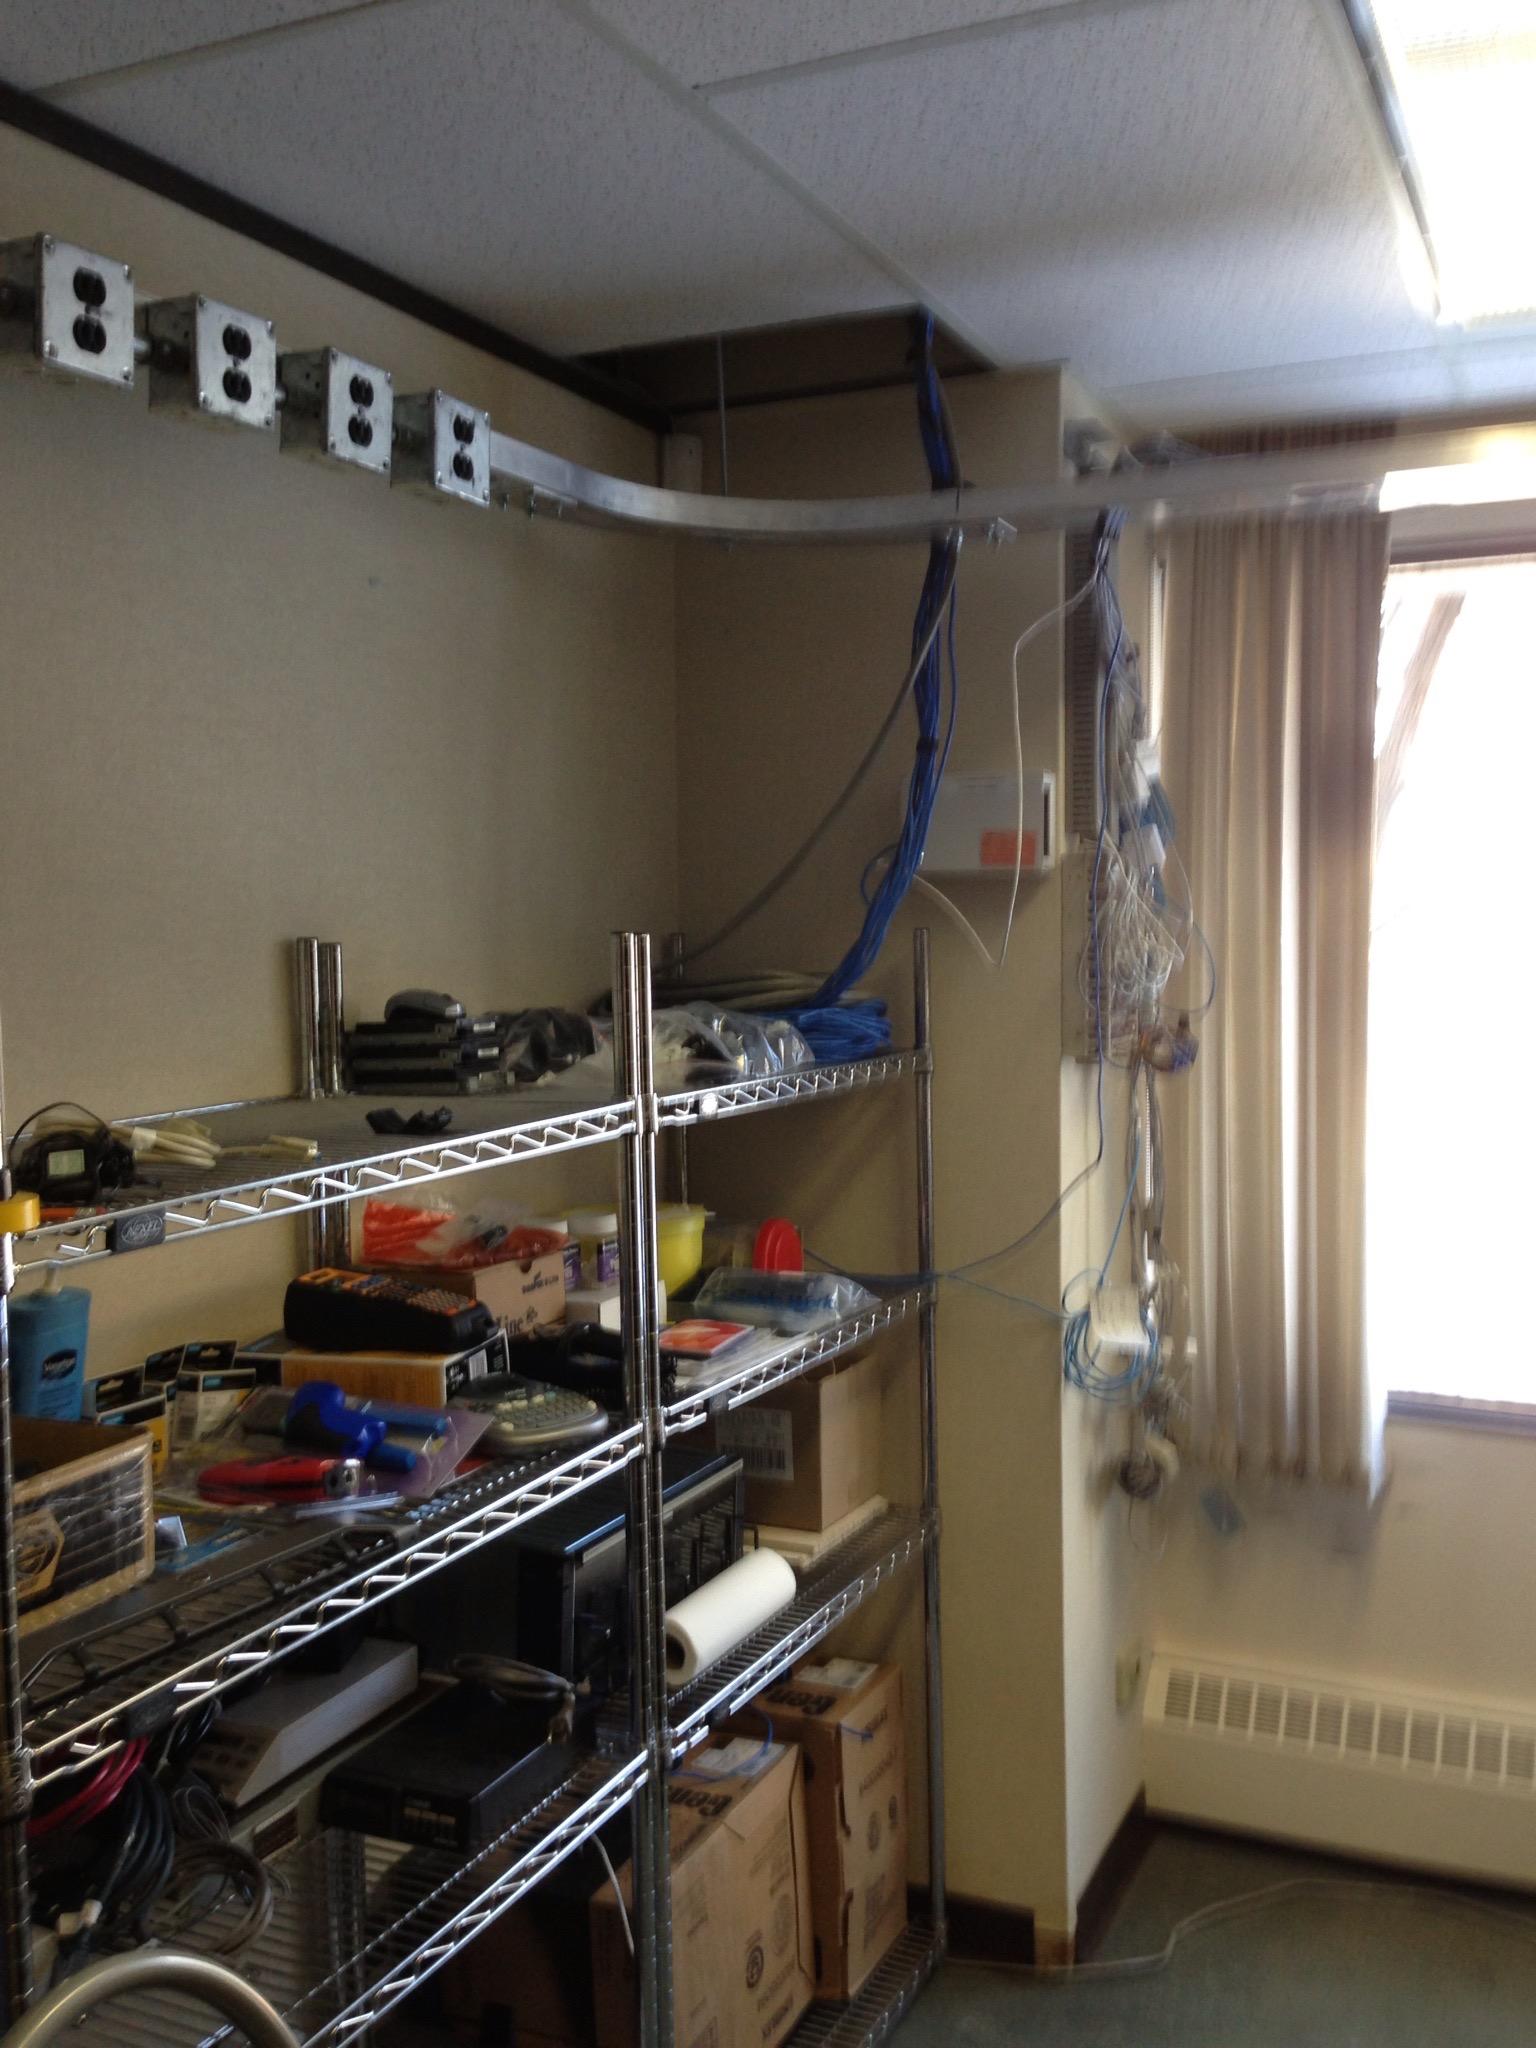 EL07  Electrical - General Contractors Commercial Renovations in Edmonton, Office and Warehouse Project Contractors